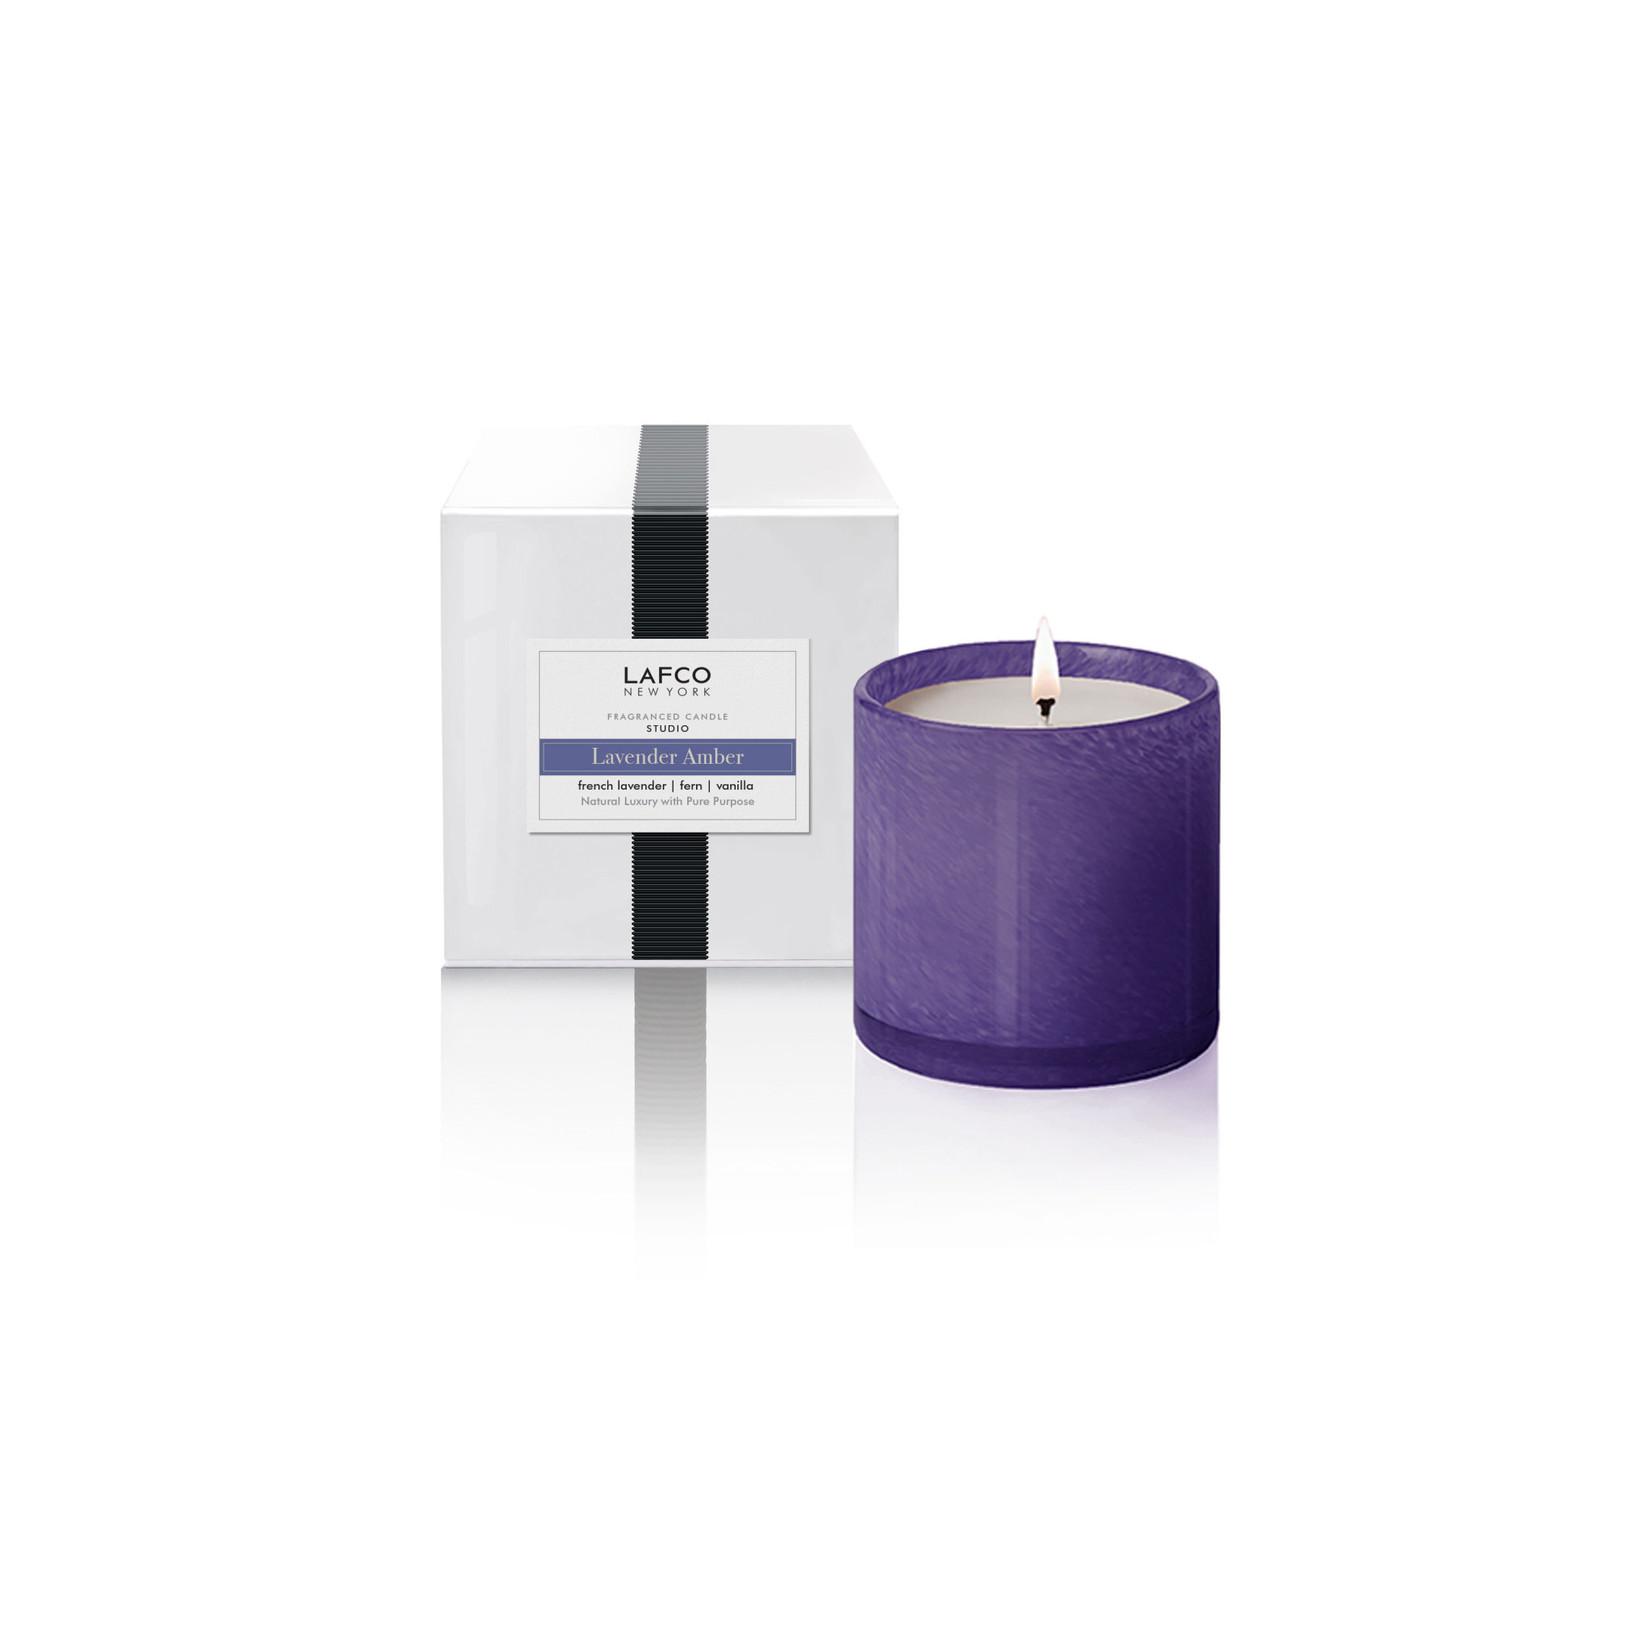 Lavender Amber Signature Candle